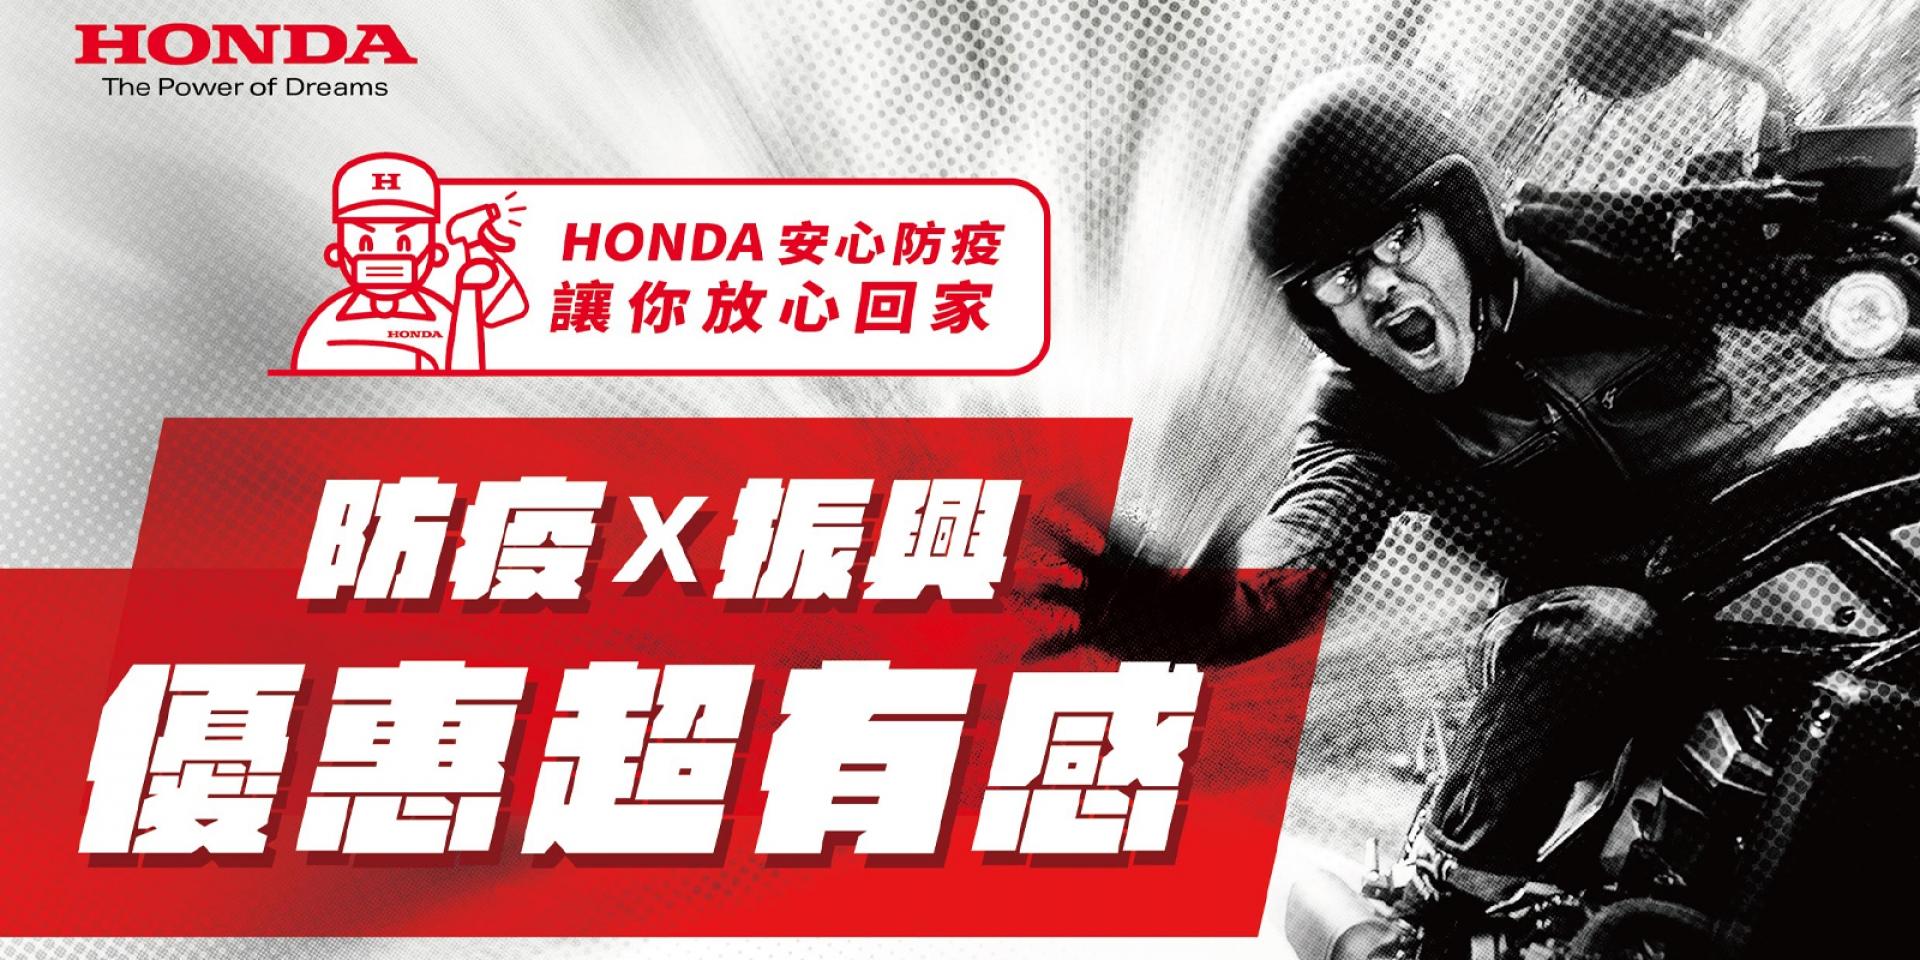 Honda Motorcycle「HONDA振興超有感」活動開跑